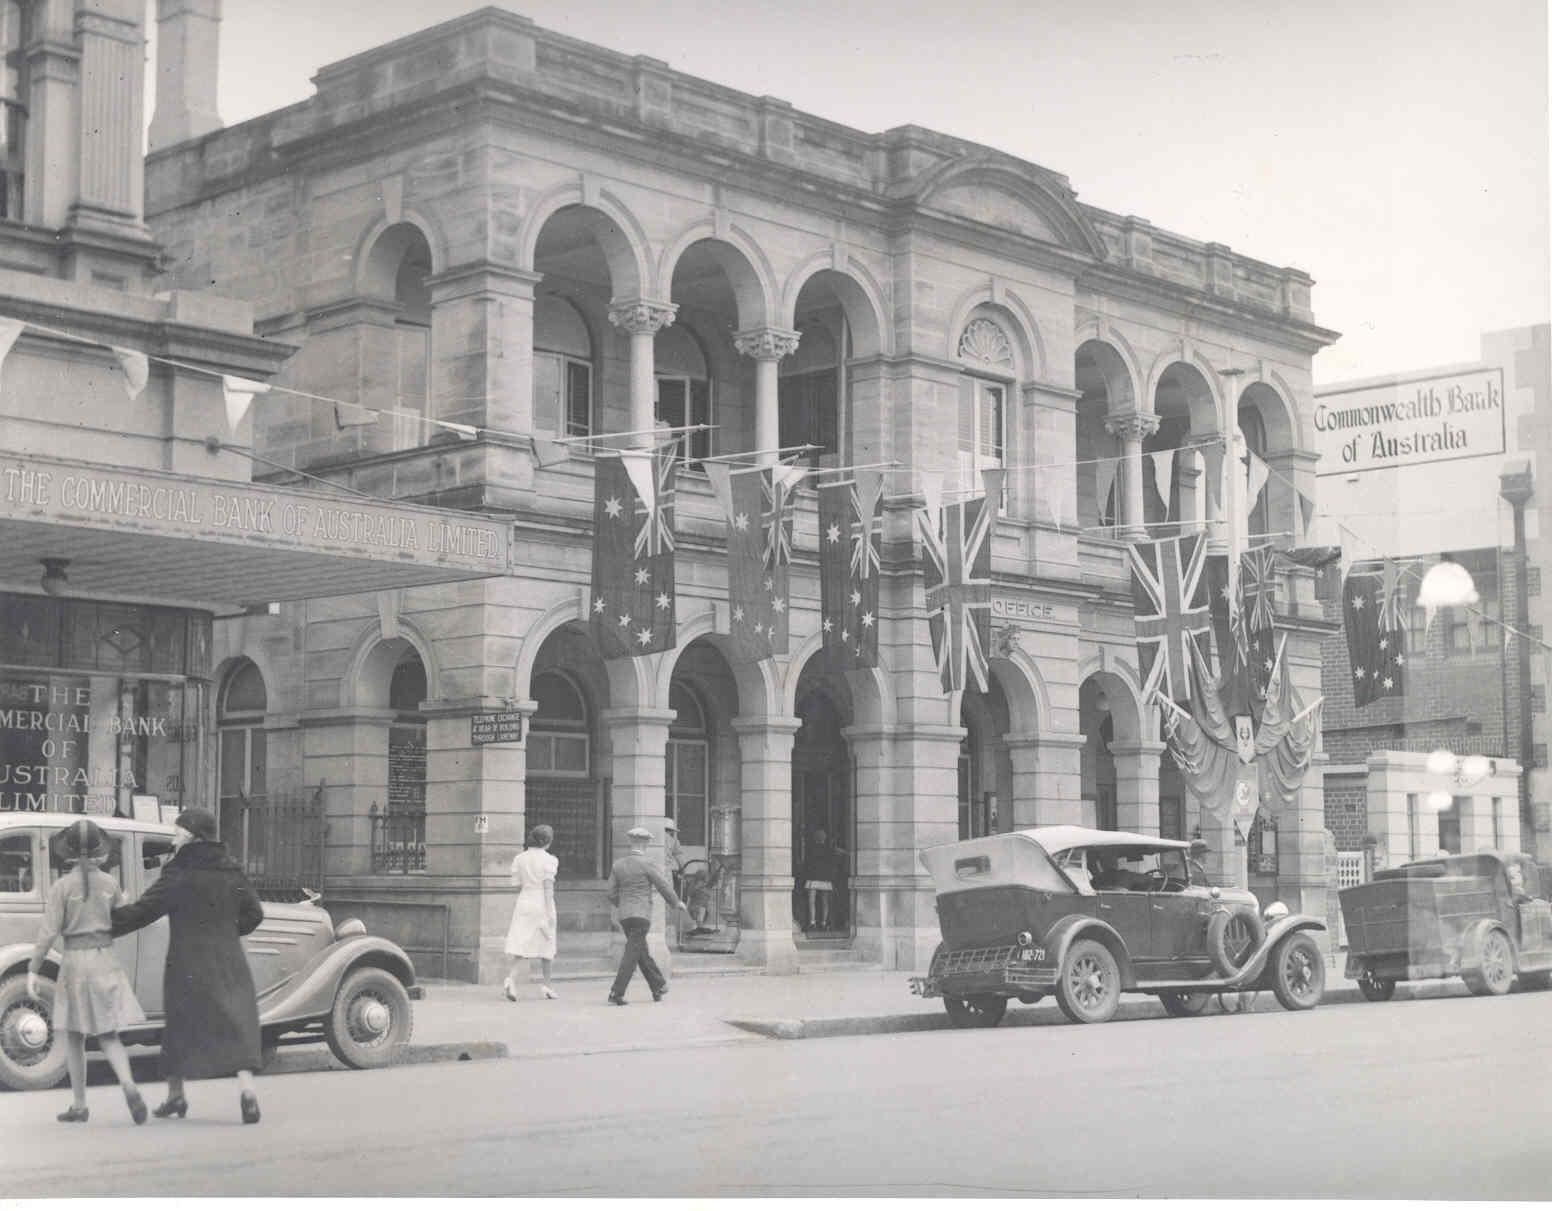 Church Street in 1930's